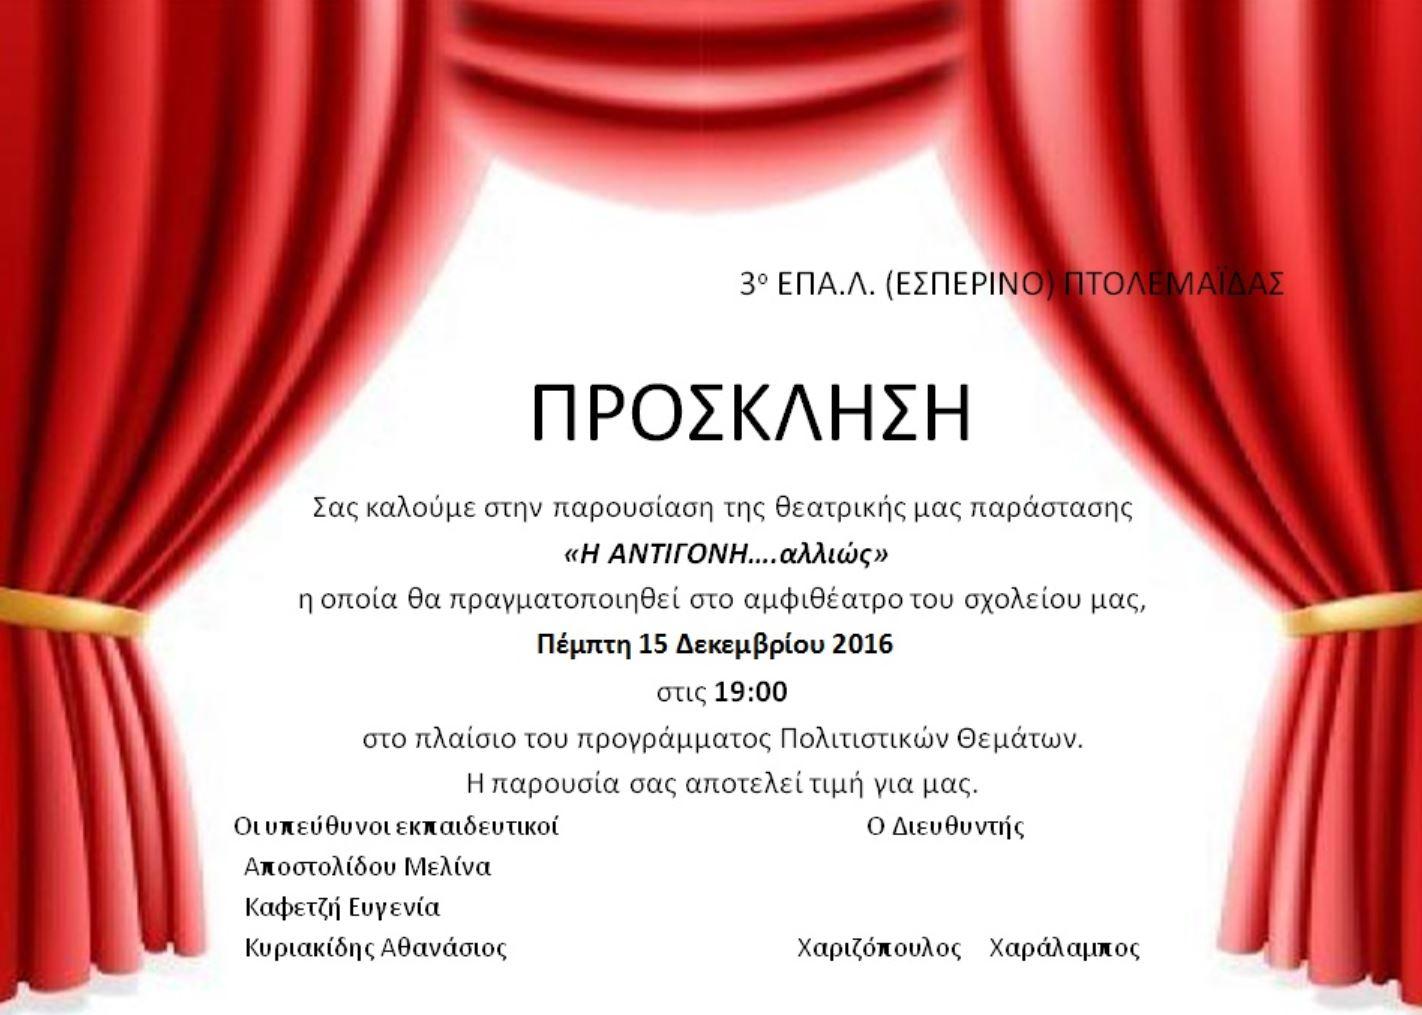 "To 3o ΕΠΑΛ (Εσπερινό) Πτολεμαΐδας παρουσιάζει την παράσταση ""Η Αντιγόνη …αλλιώς"" την Πέμπτη 15 Δεκεμβρίου"